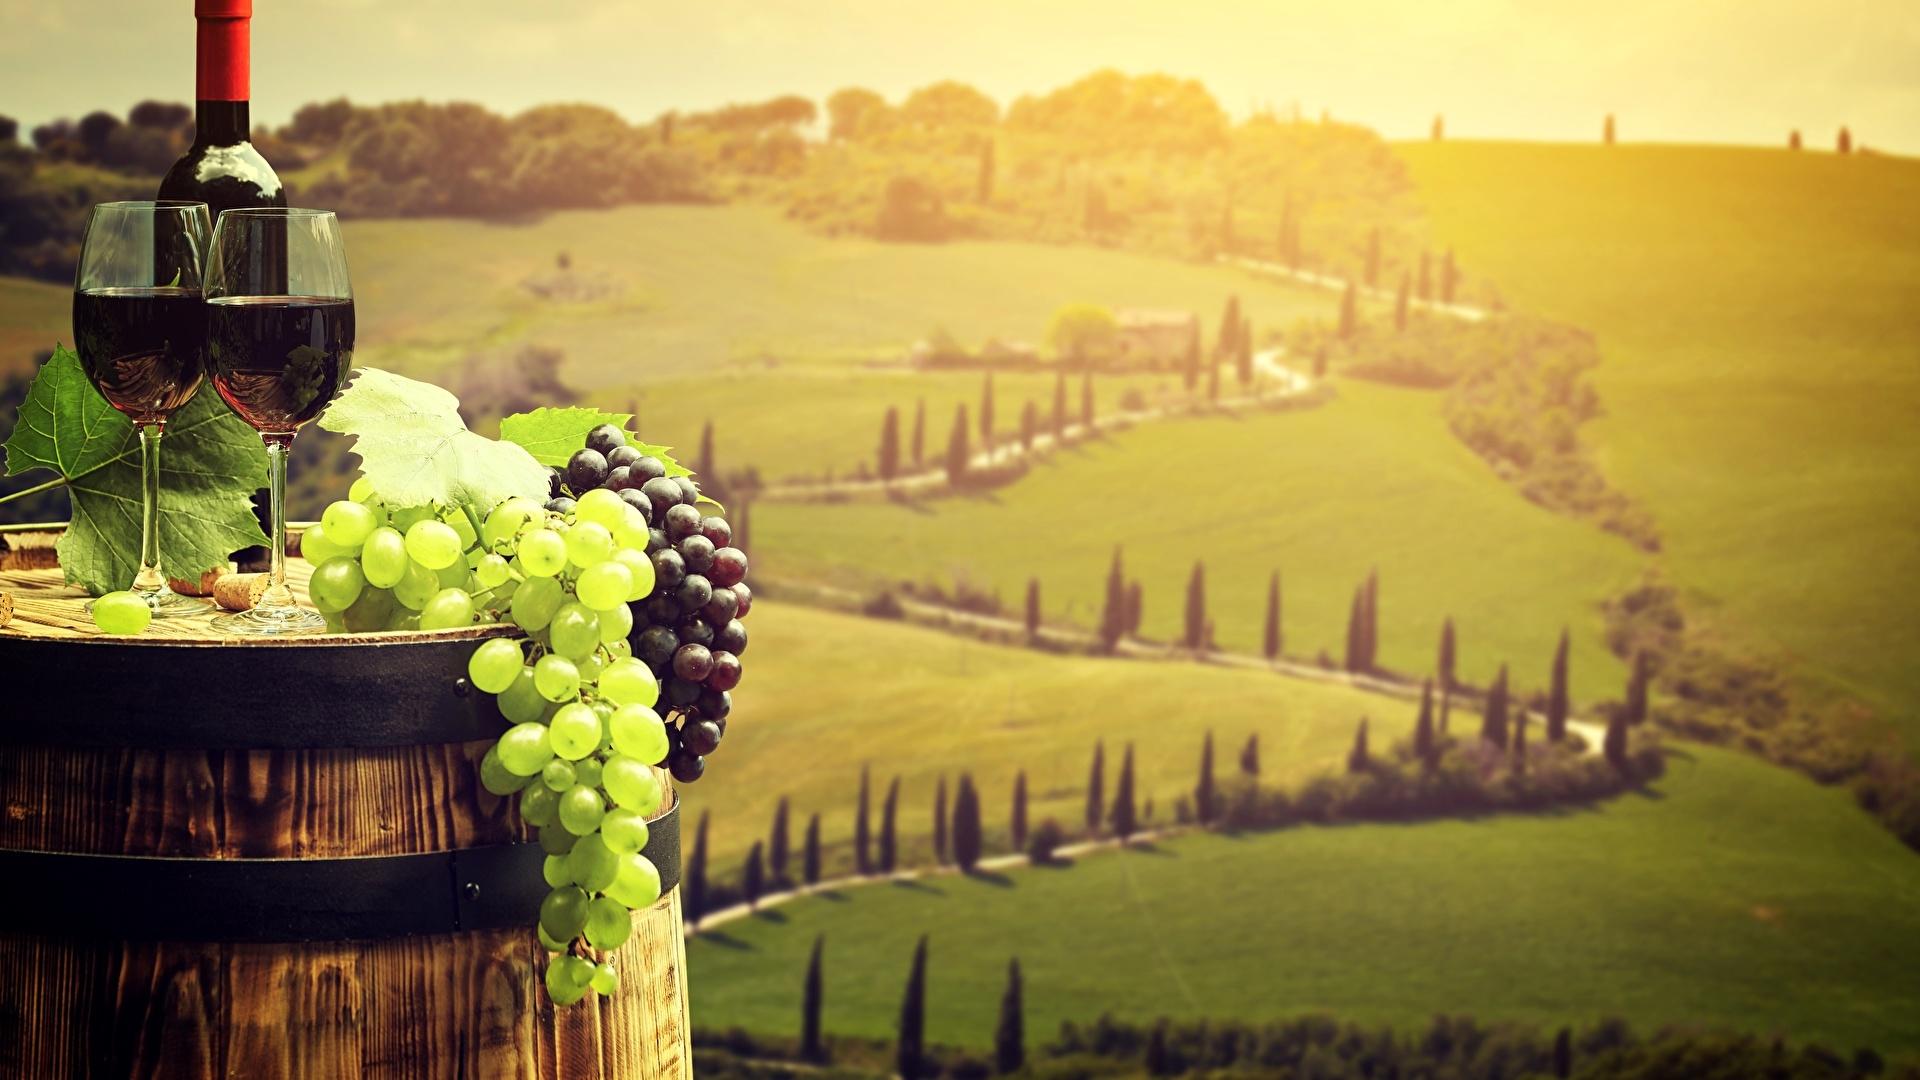 Vineyard pc wallpaper